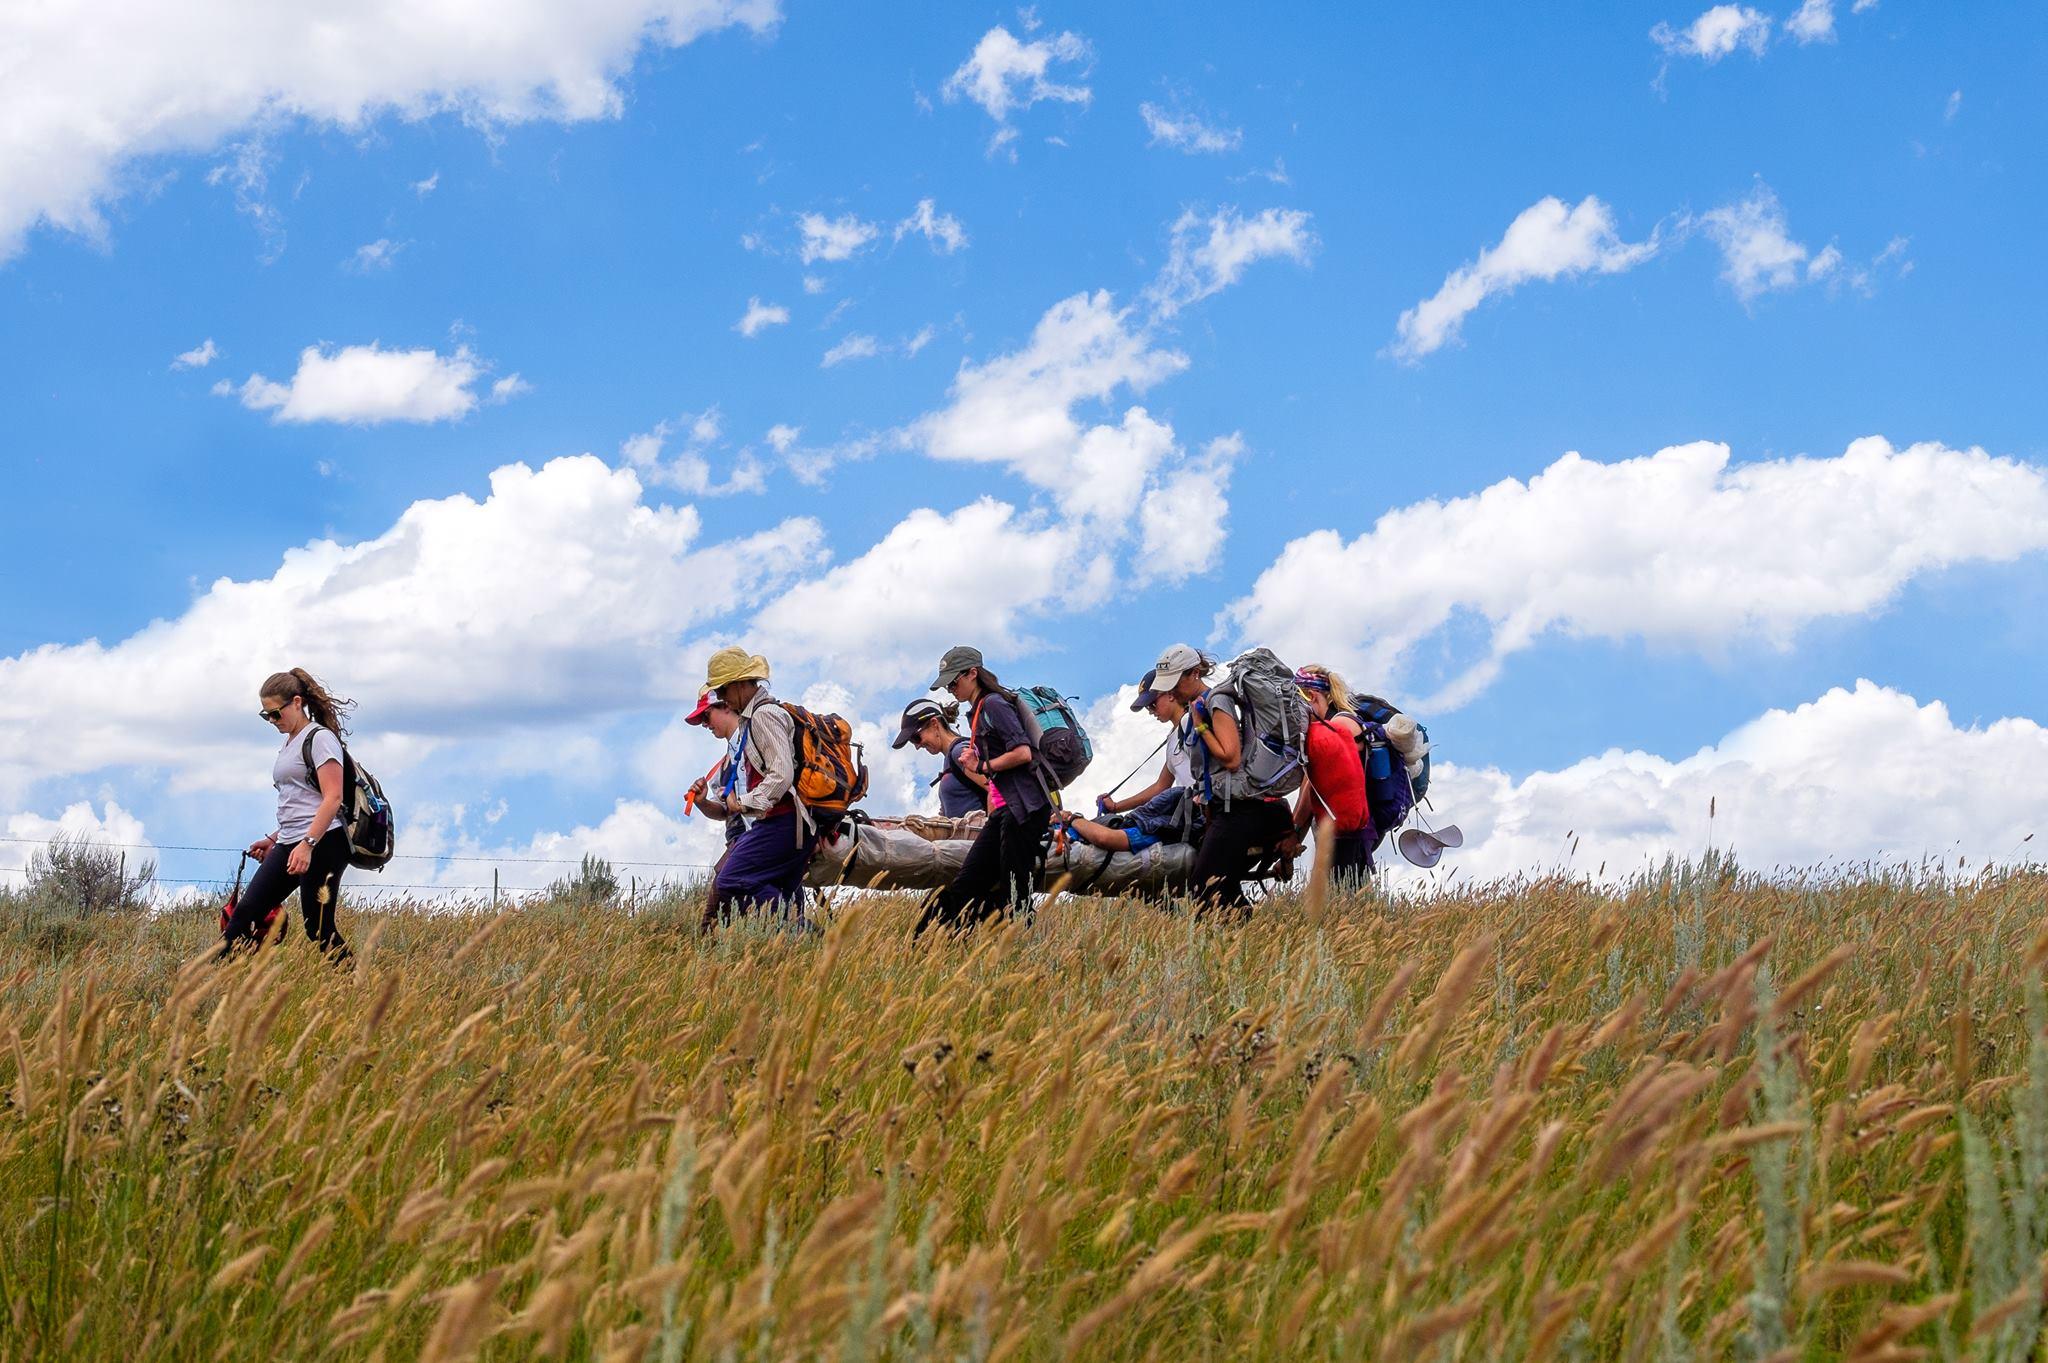 Summer Program - Environmental Conservation | NOLS Wilderness Advanced First Aid (WAFA)